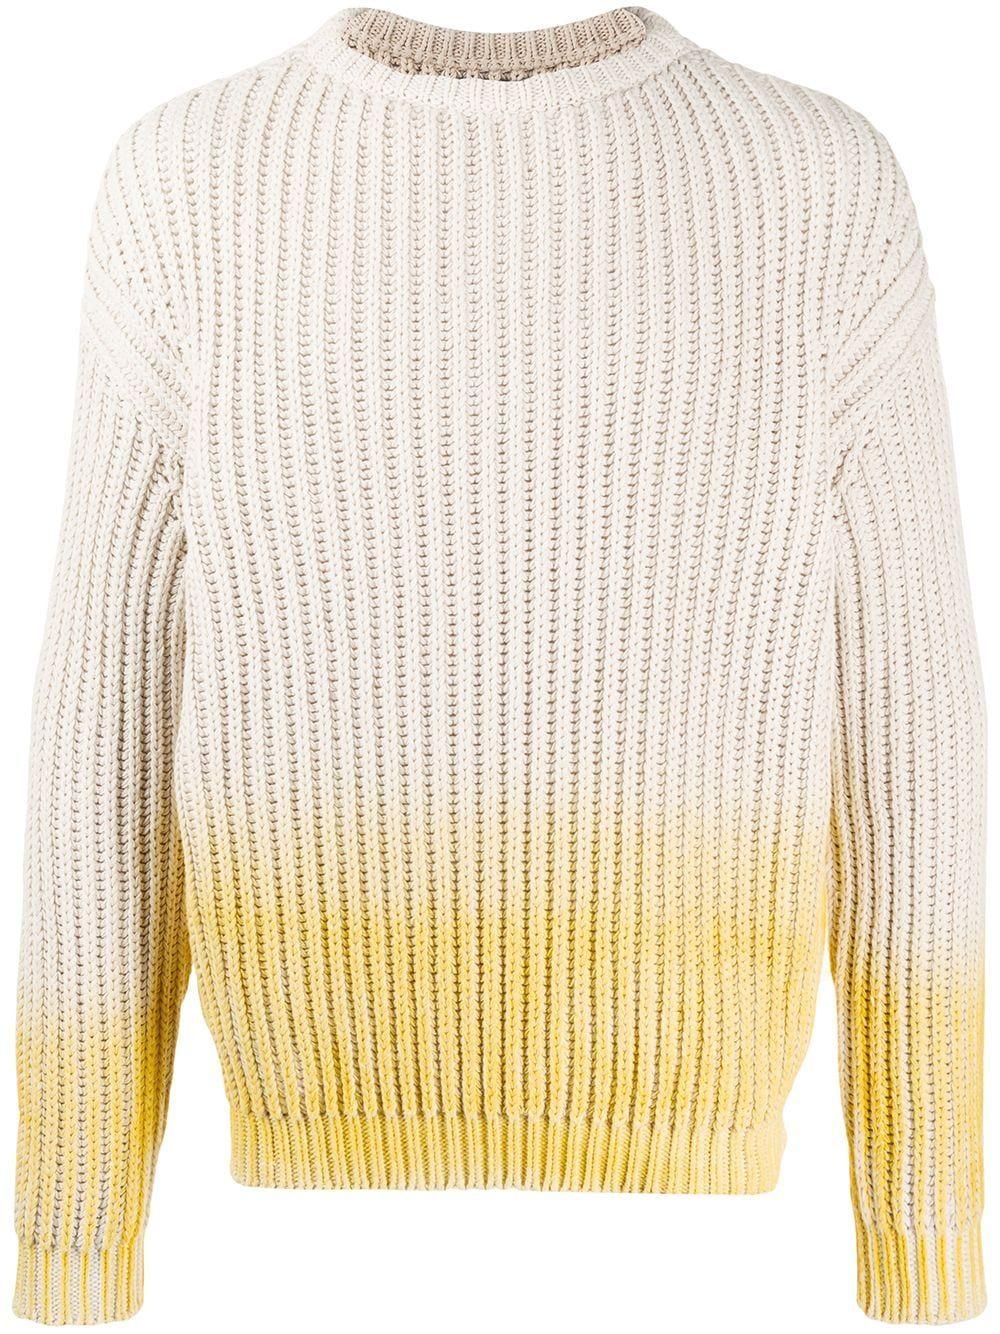 Jacquemus gradient chunky knit jumper - NEUTRALS #chunkyknitjumper